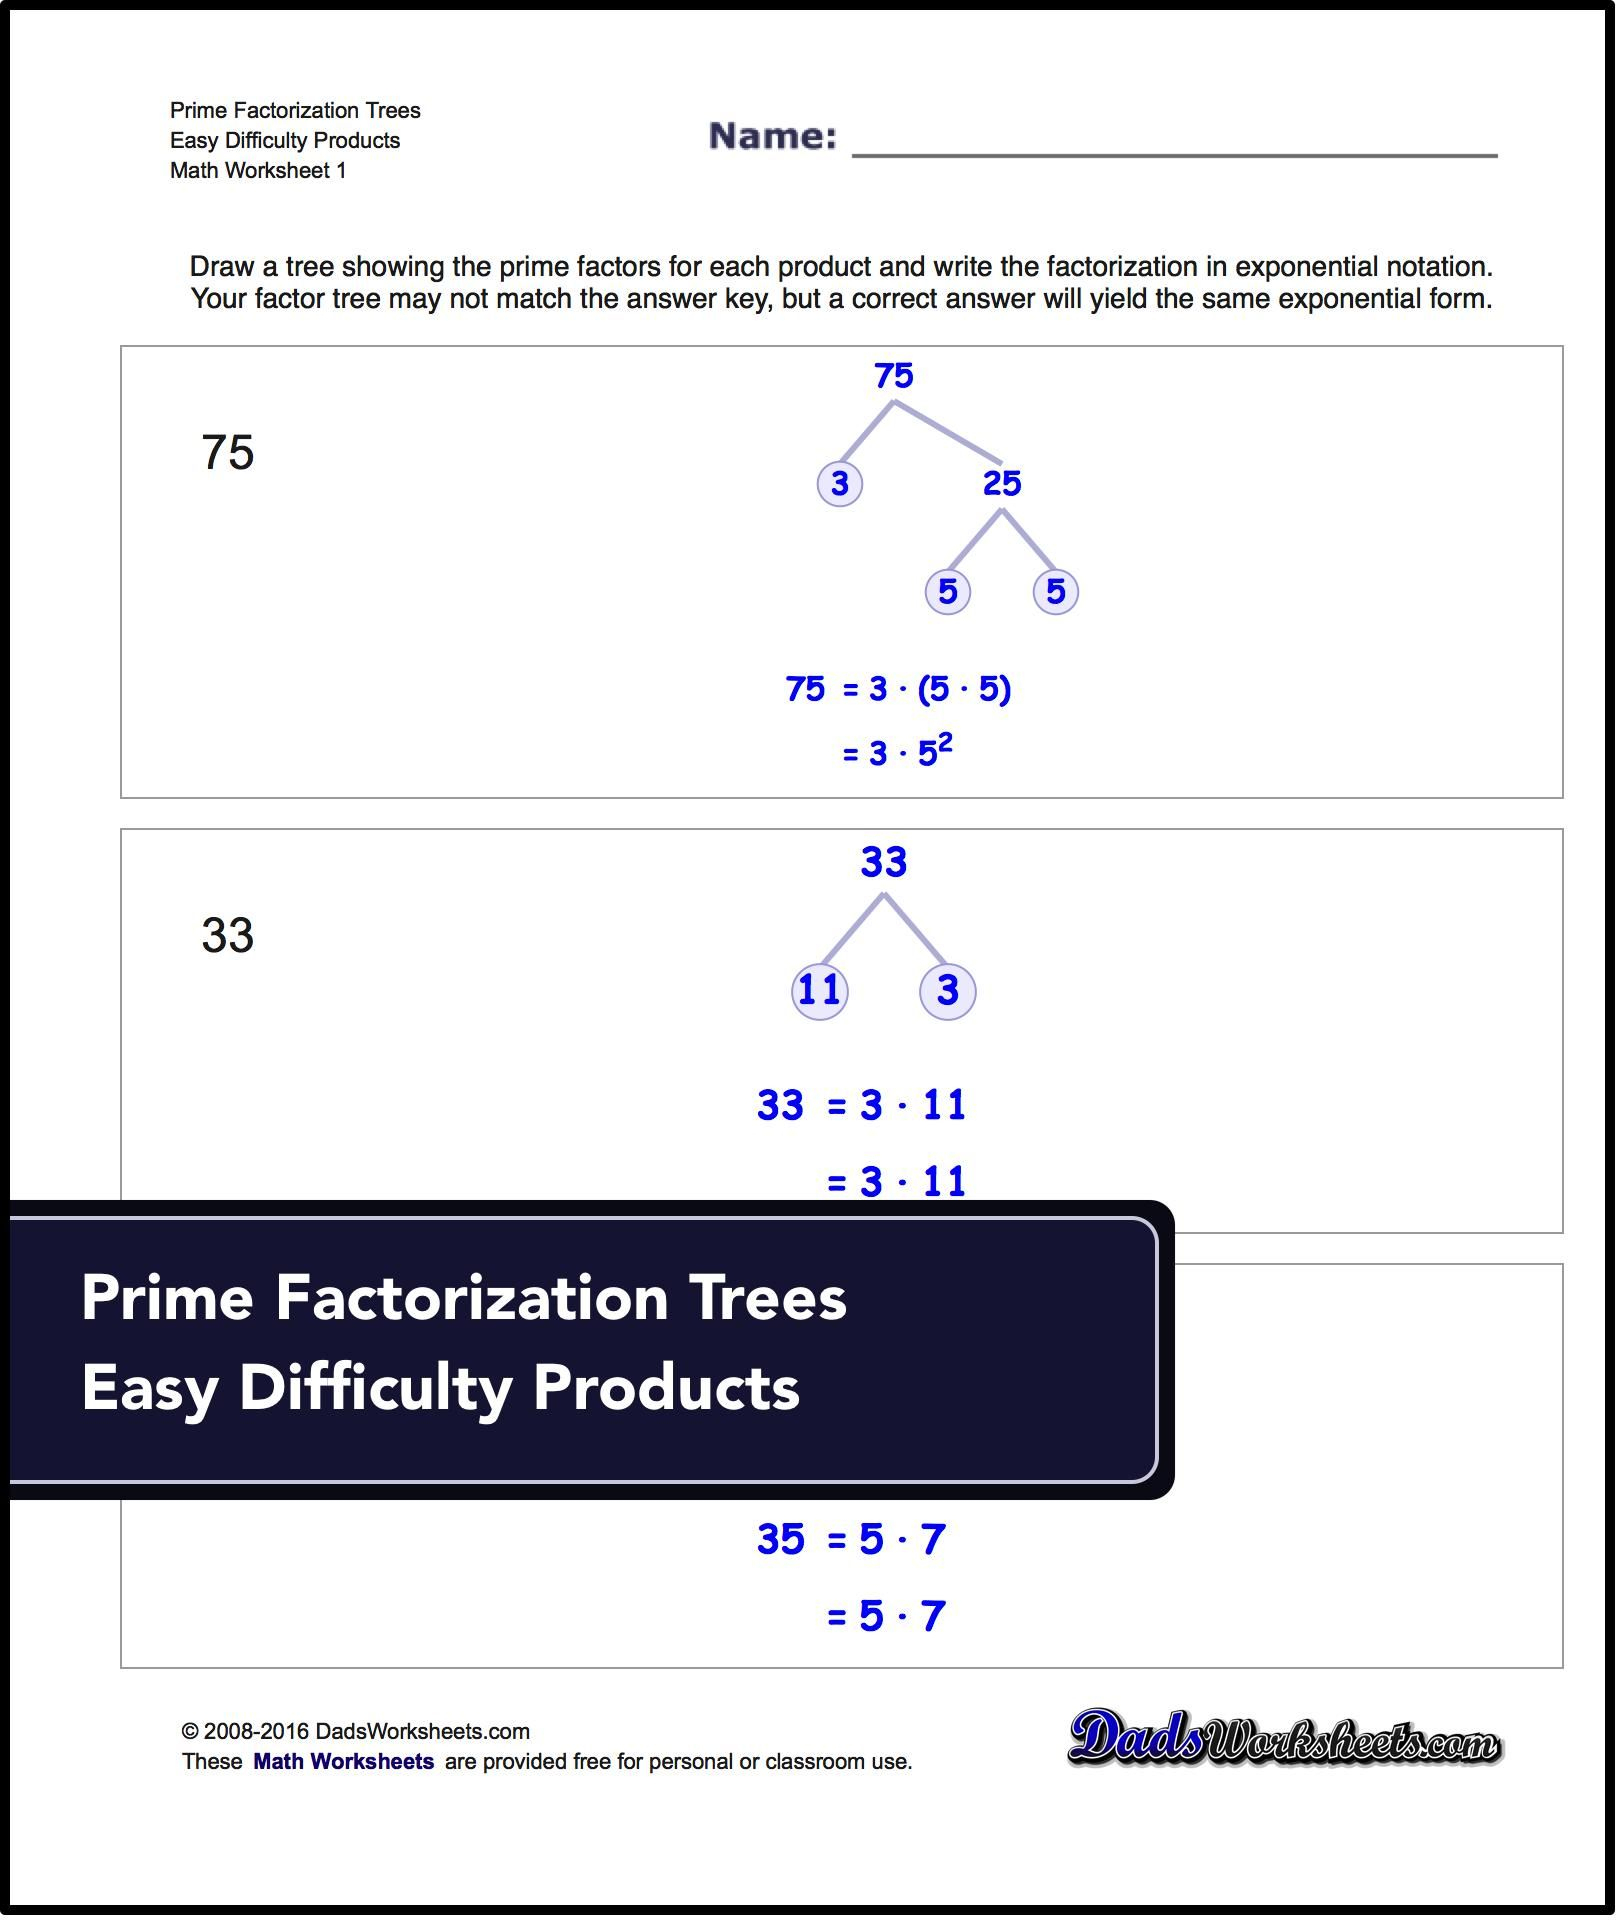 Factorization, Gcd, Lcm Printable Worksheets For Free! | Math - Free Printable Lcm Worksheets